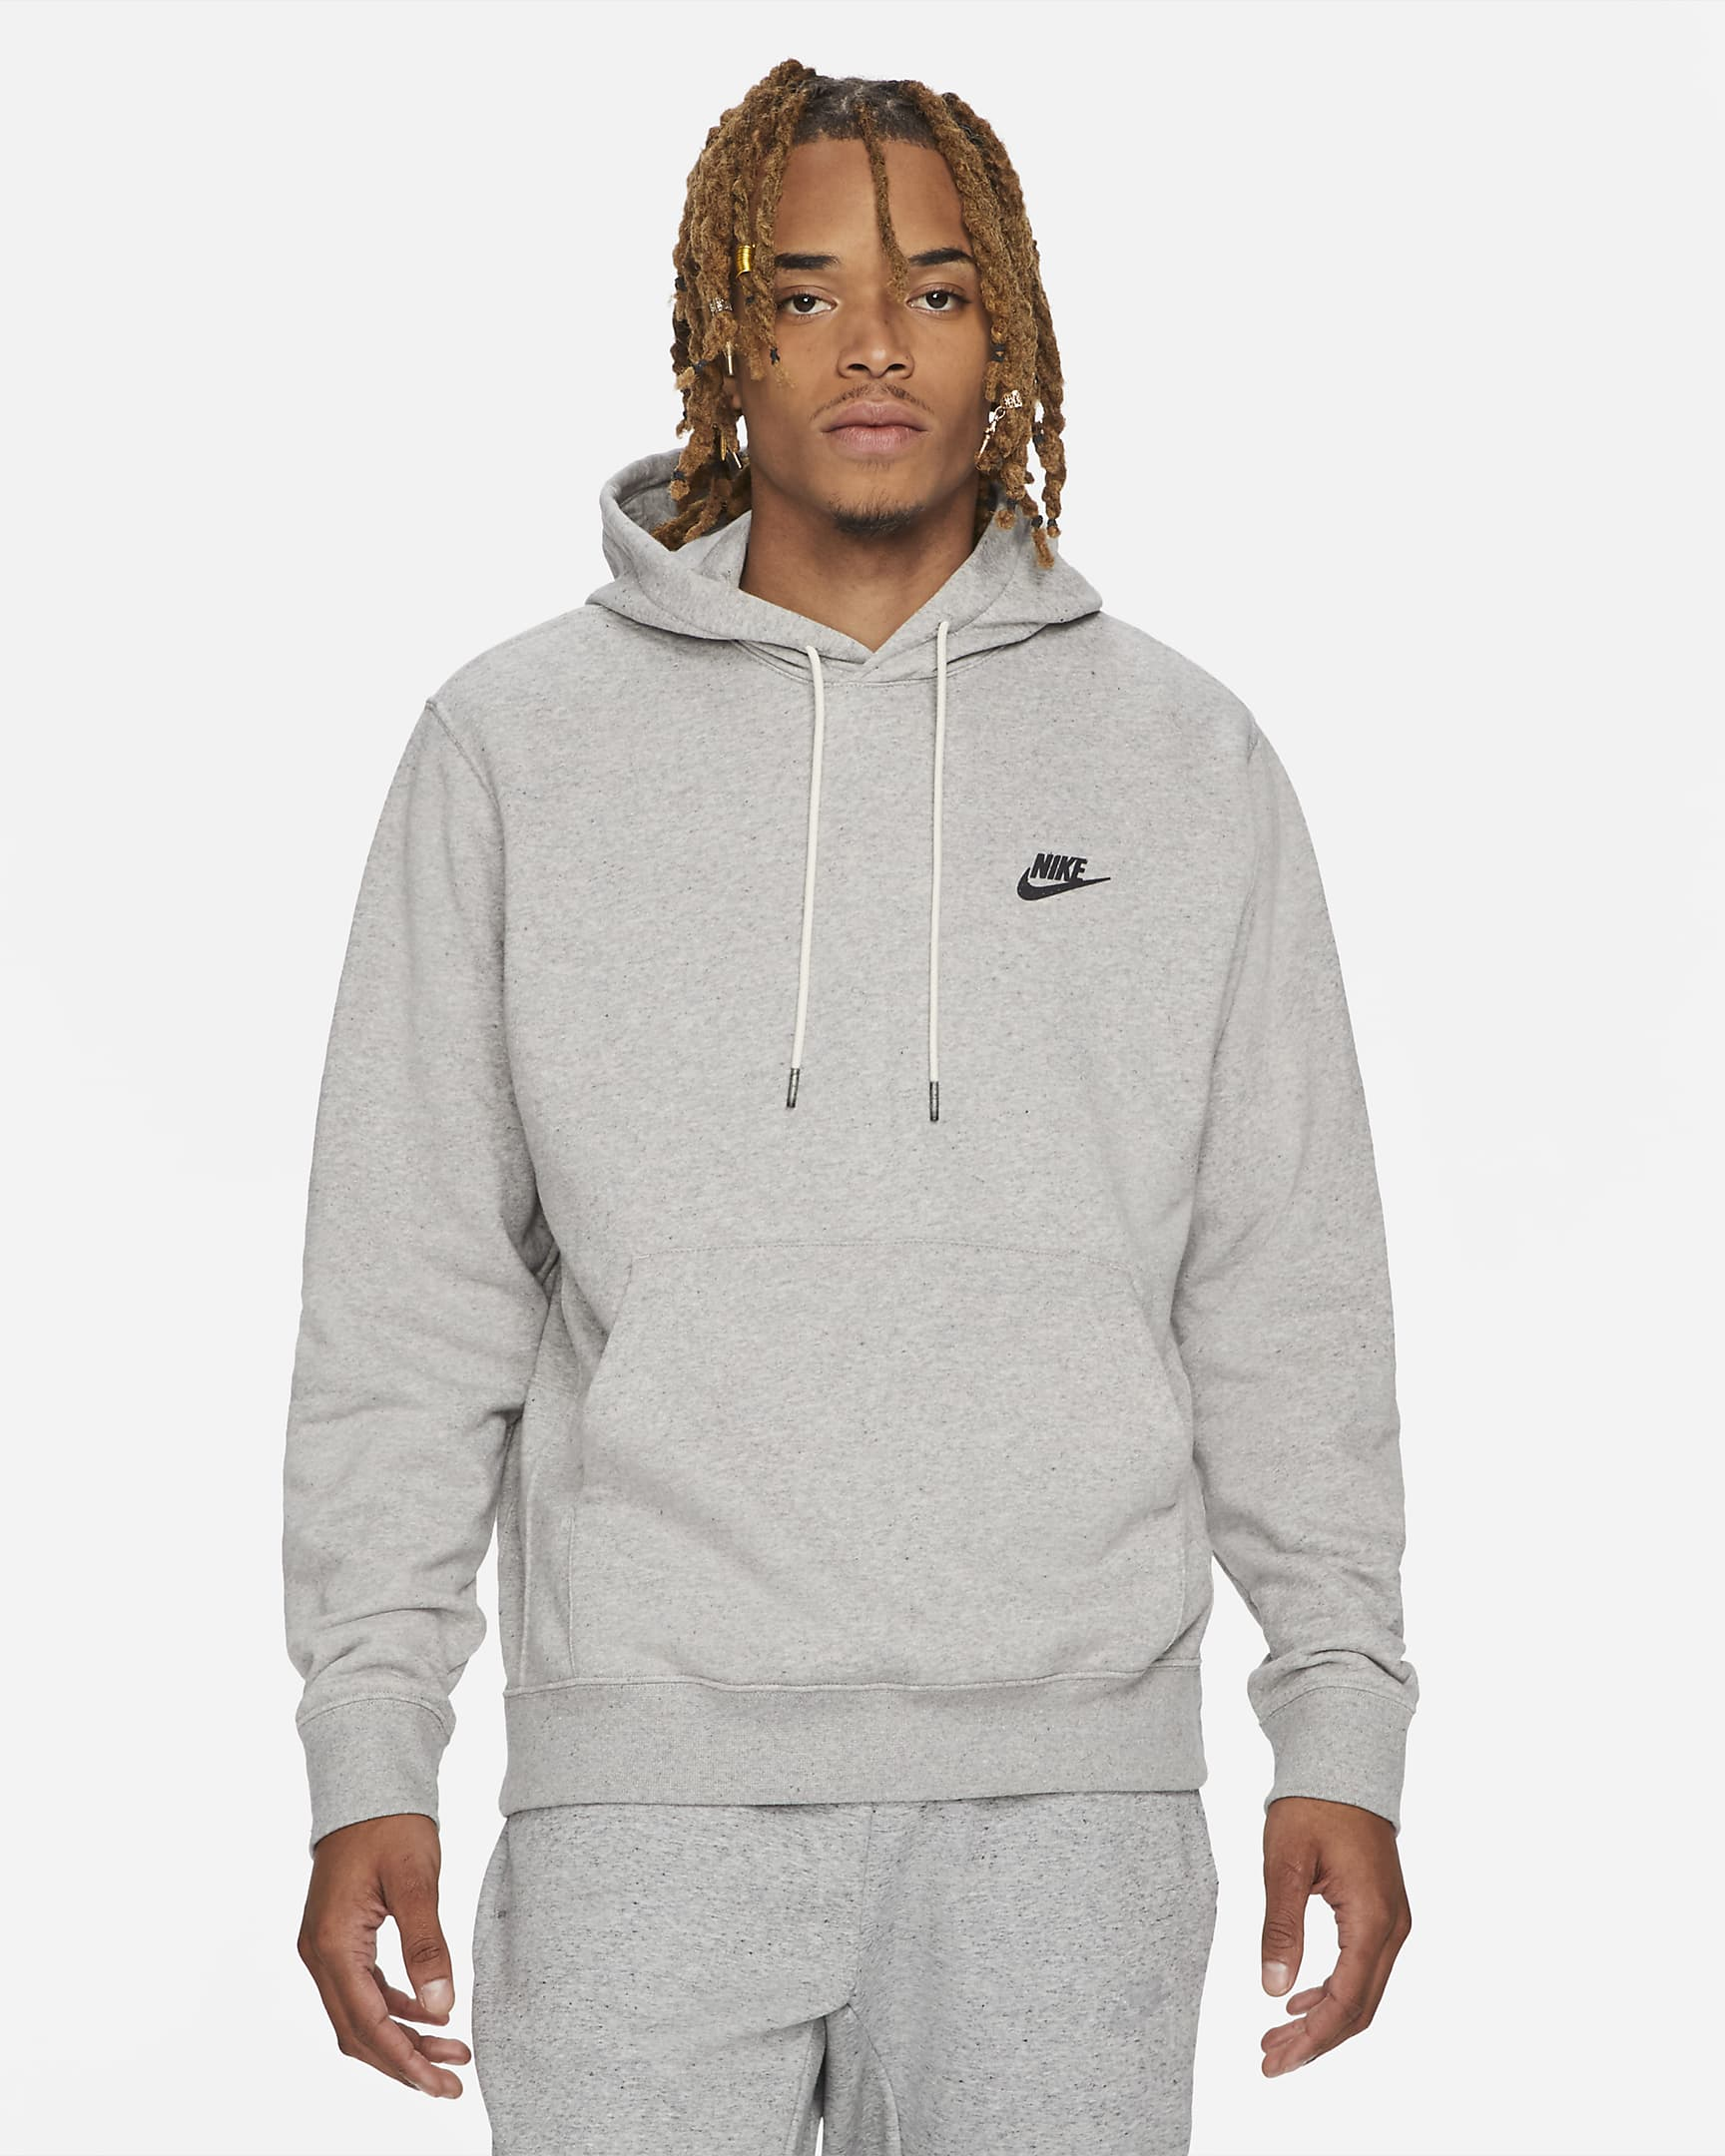 sportswear-mens-pullover-hoodie-QCsHSk-5